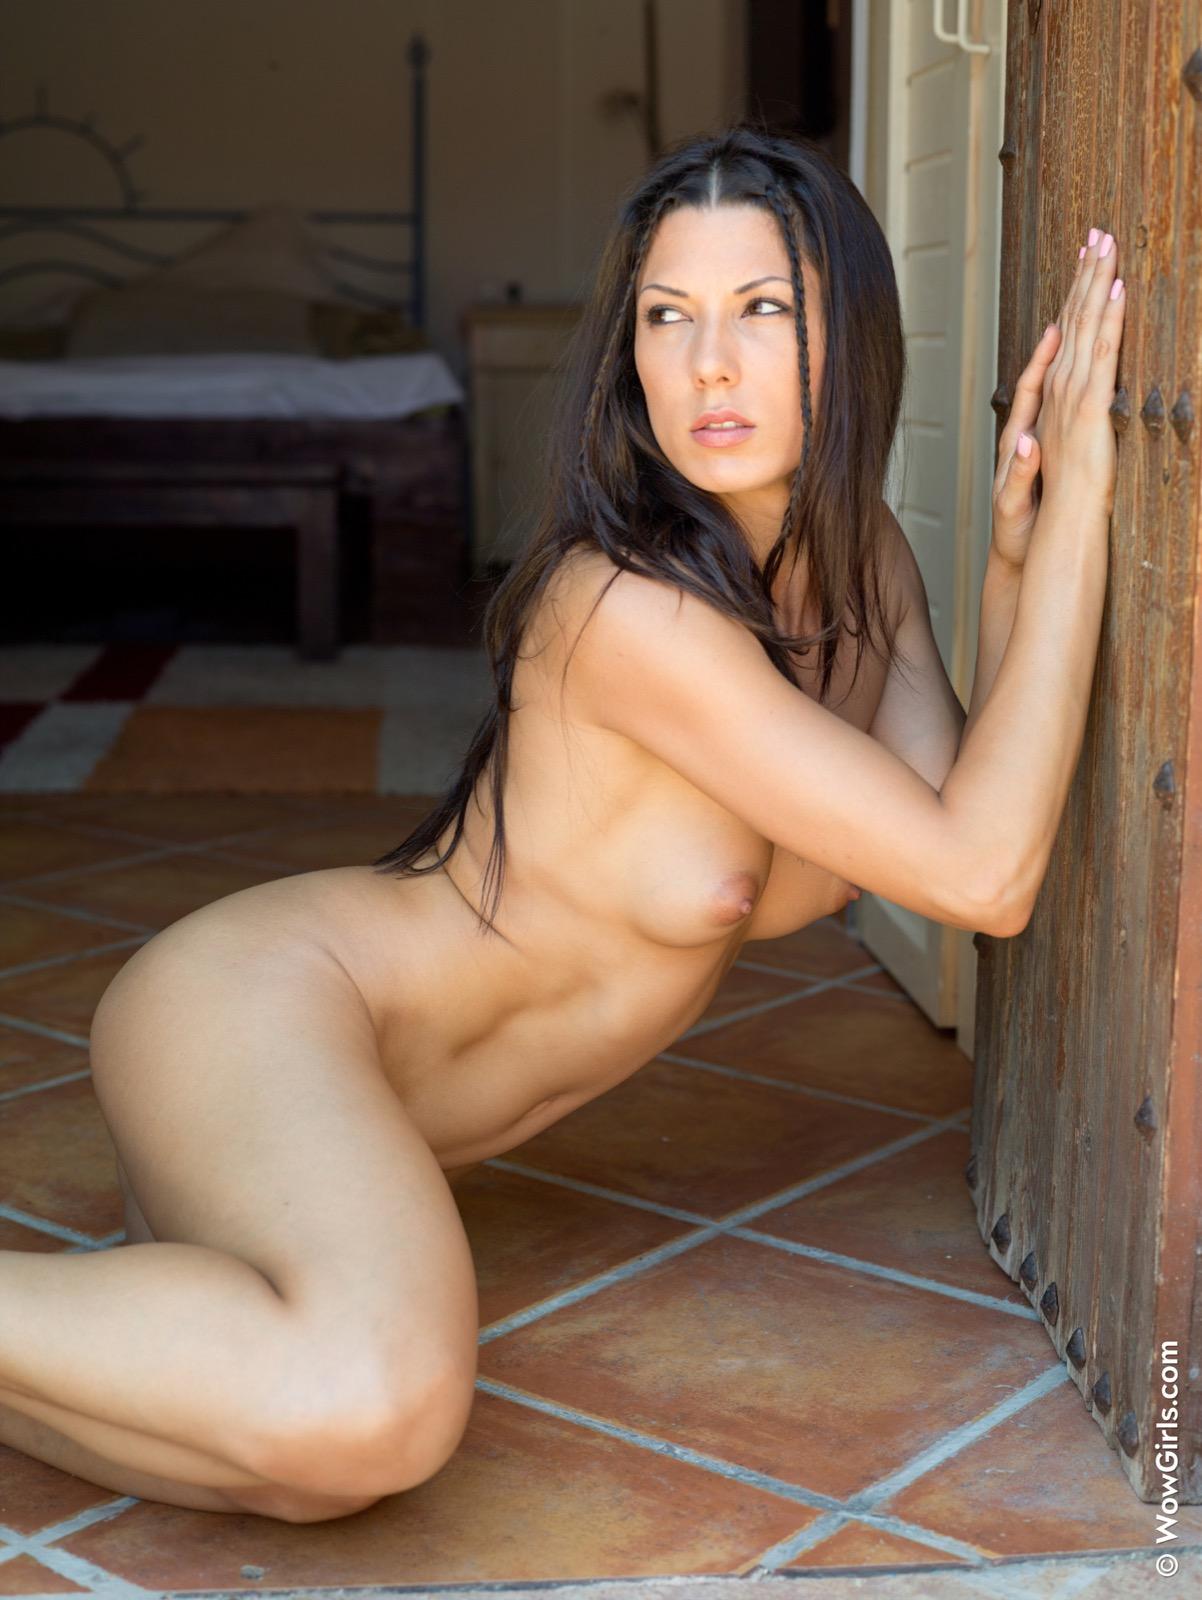 alexa_tomas_28849_8.jpg